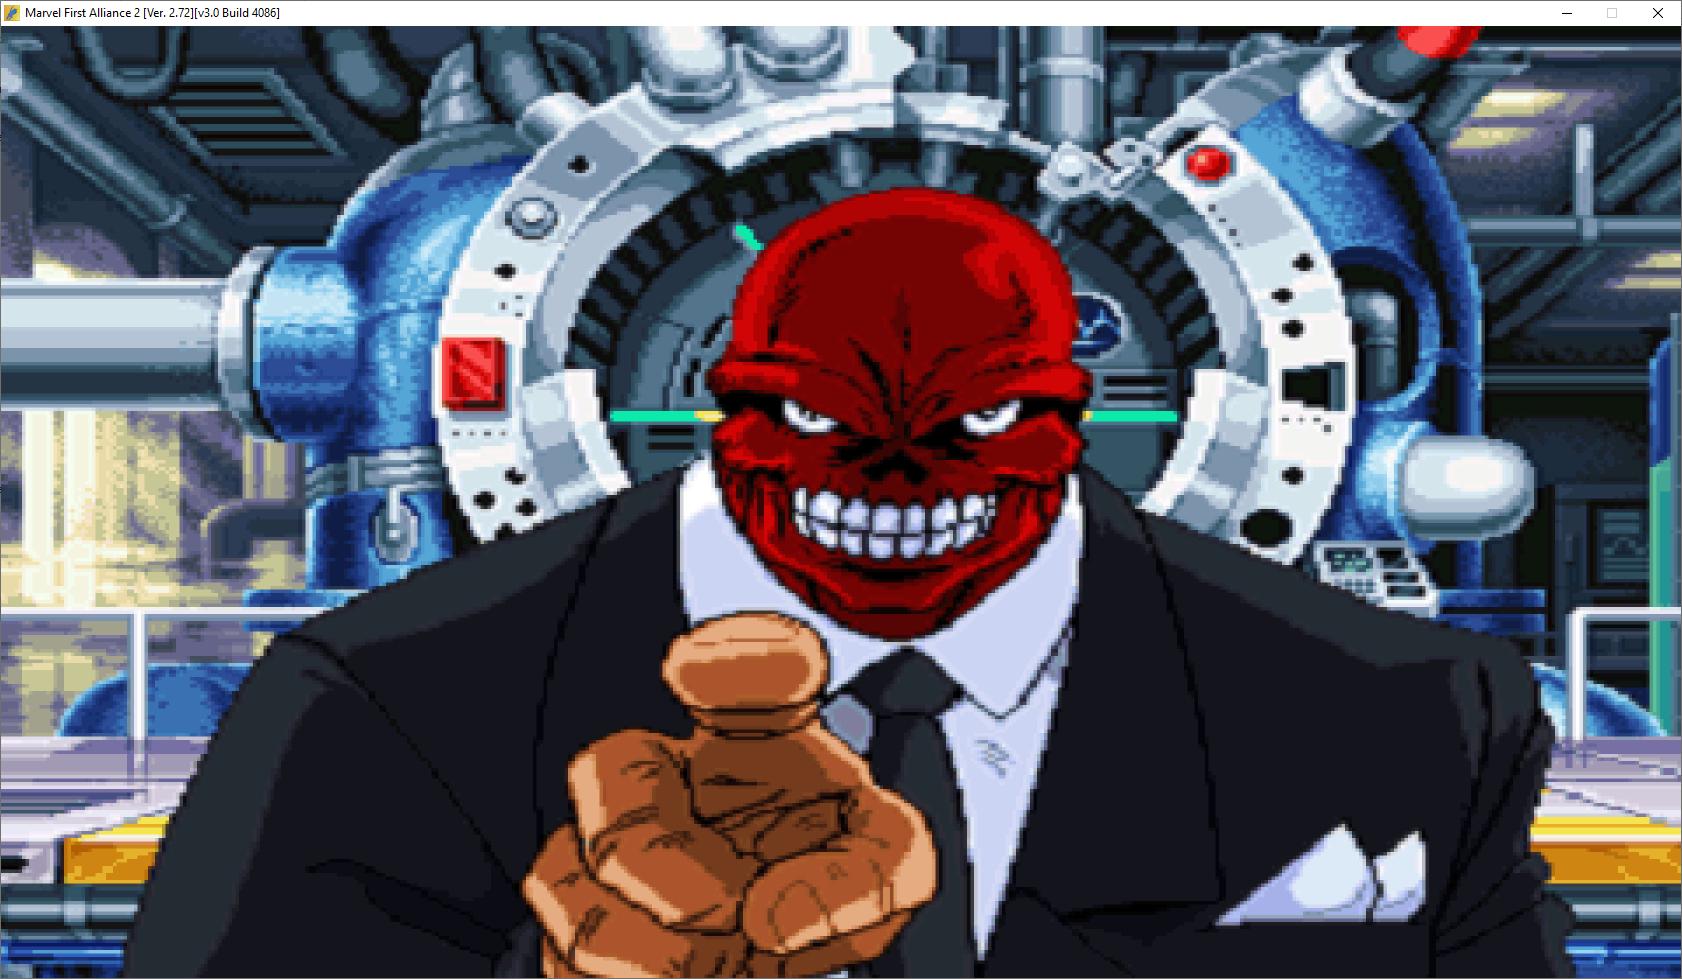 Marvel First Alliance 2